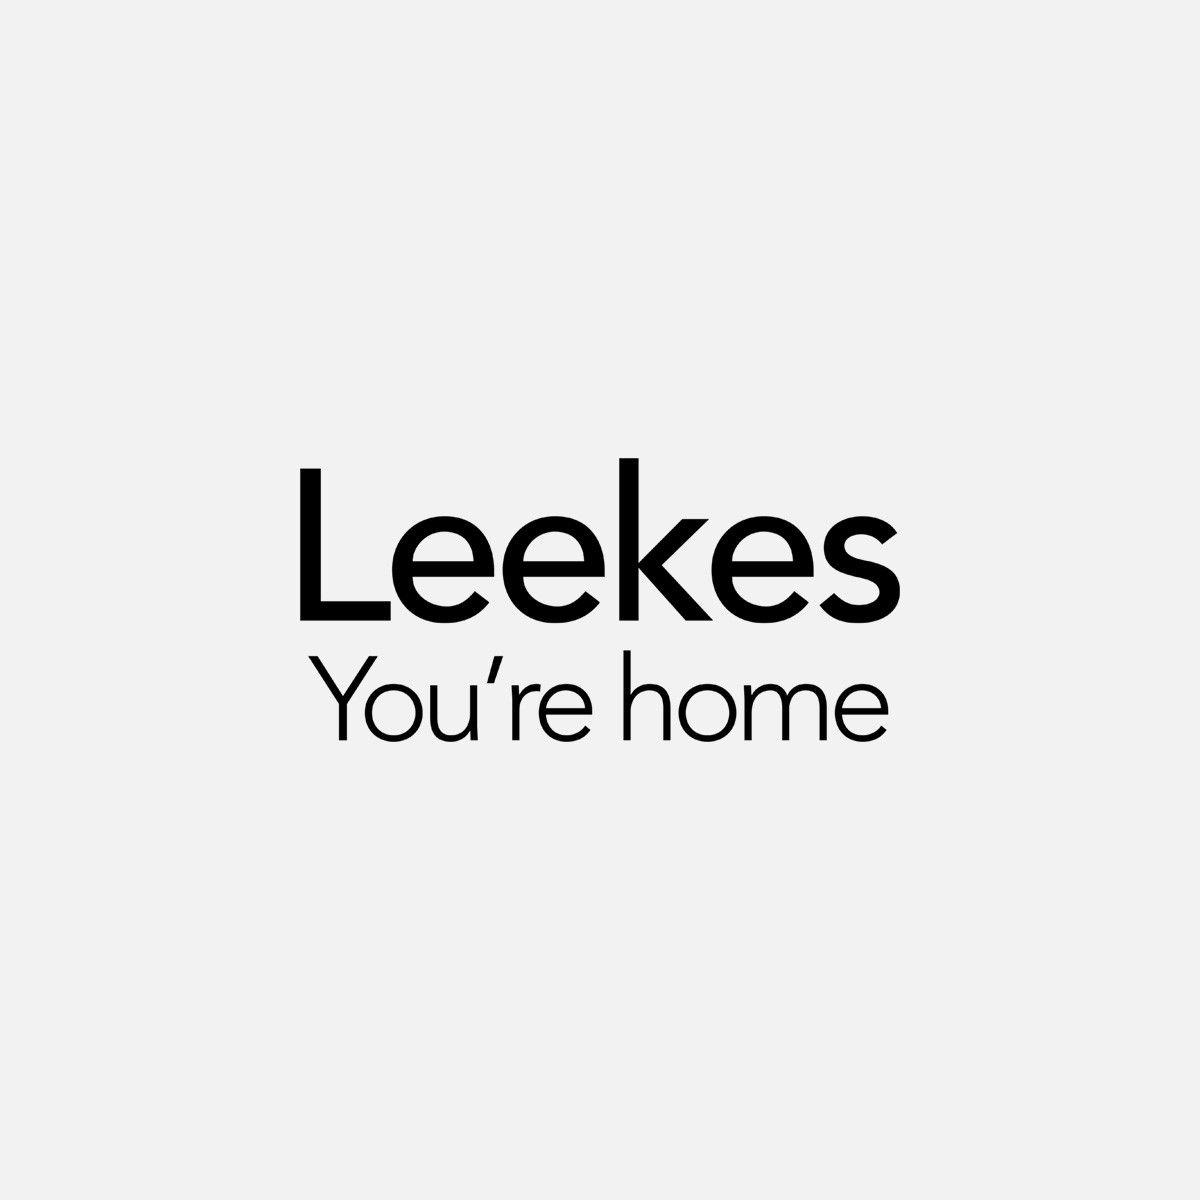 Sebo 90573 Bagged Upright Vacuum Cleaner, Black